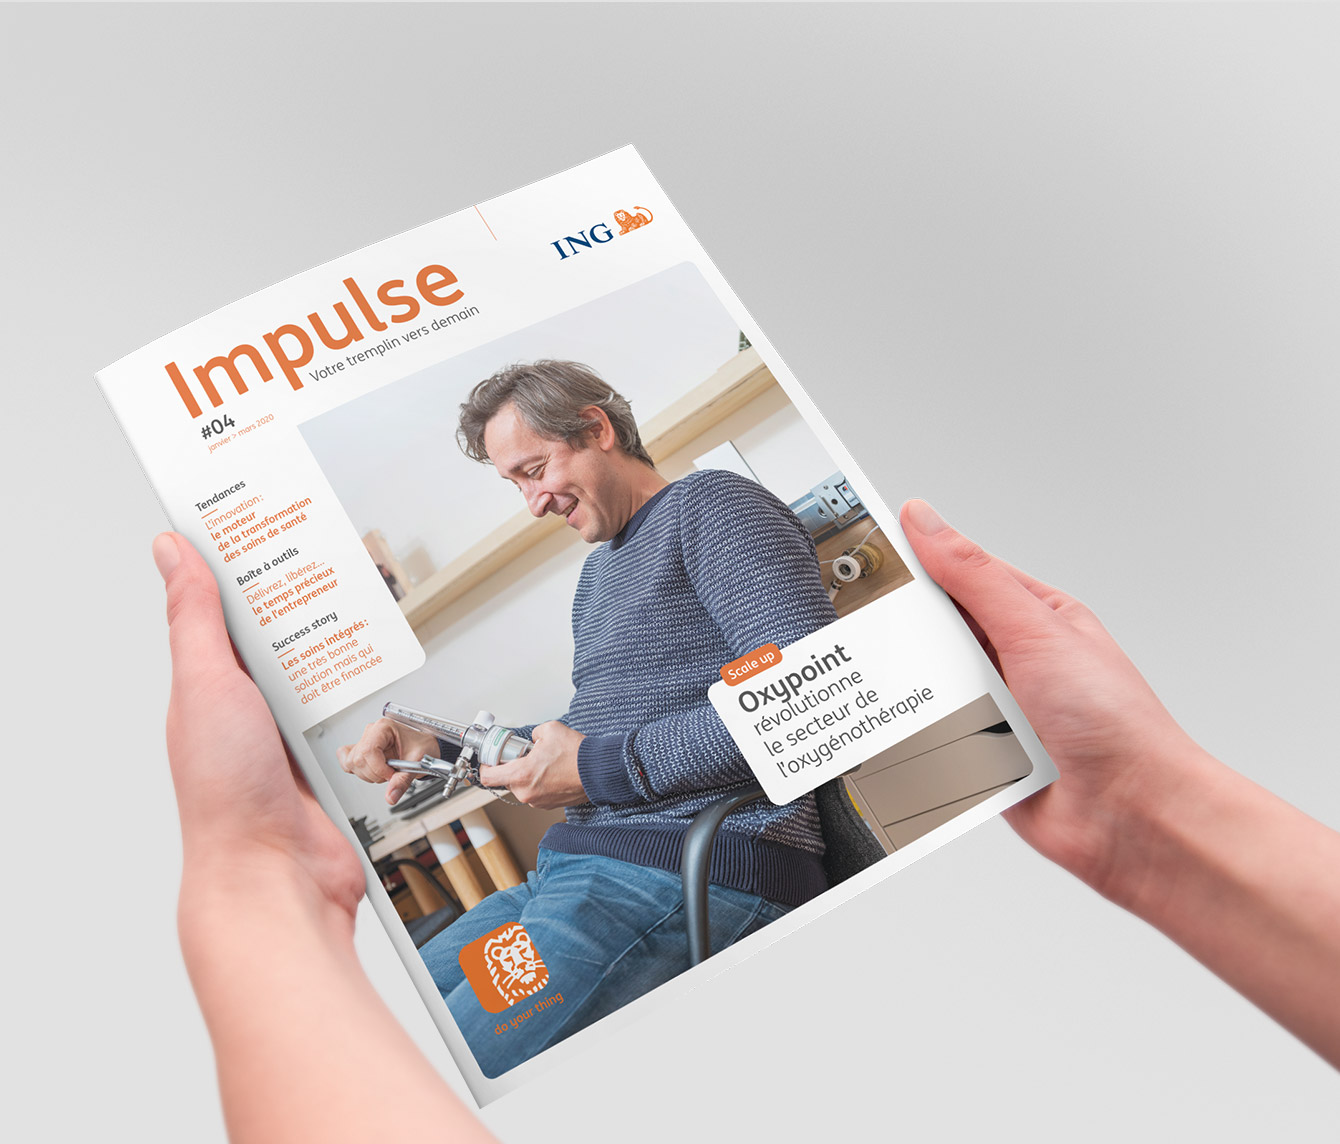 Hands holding print magazine